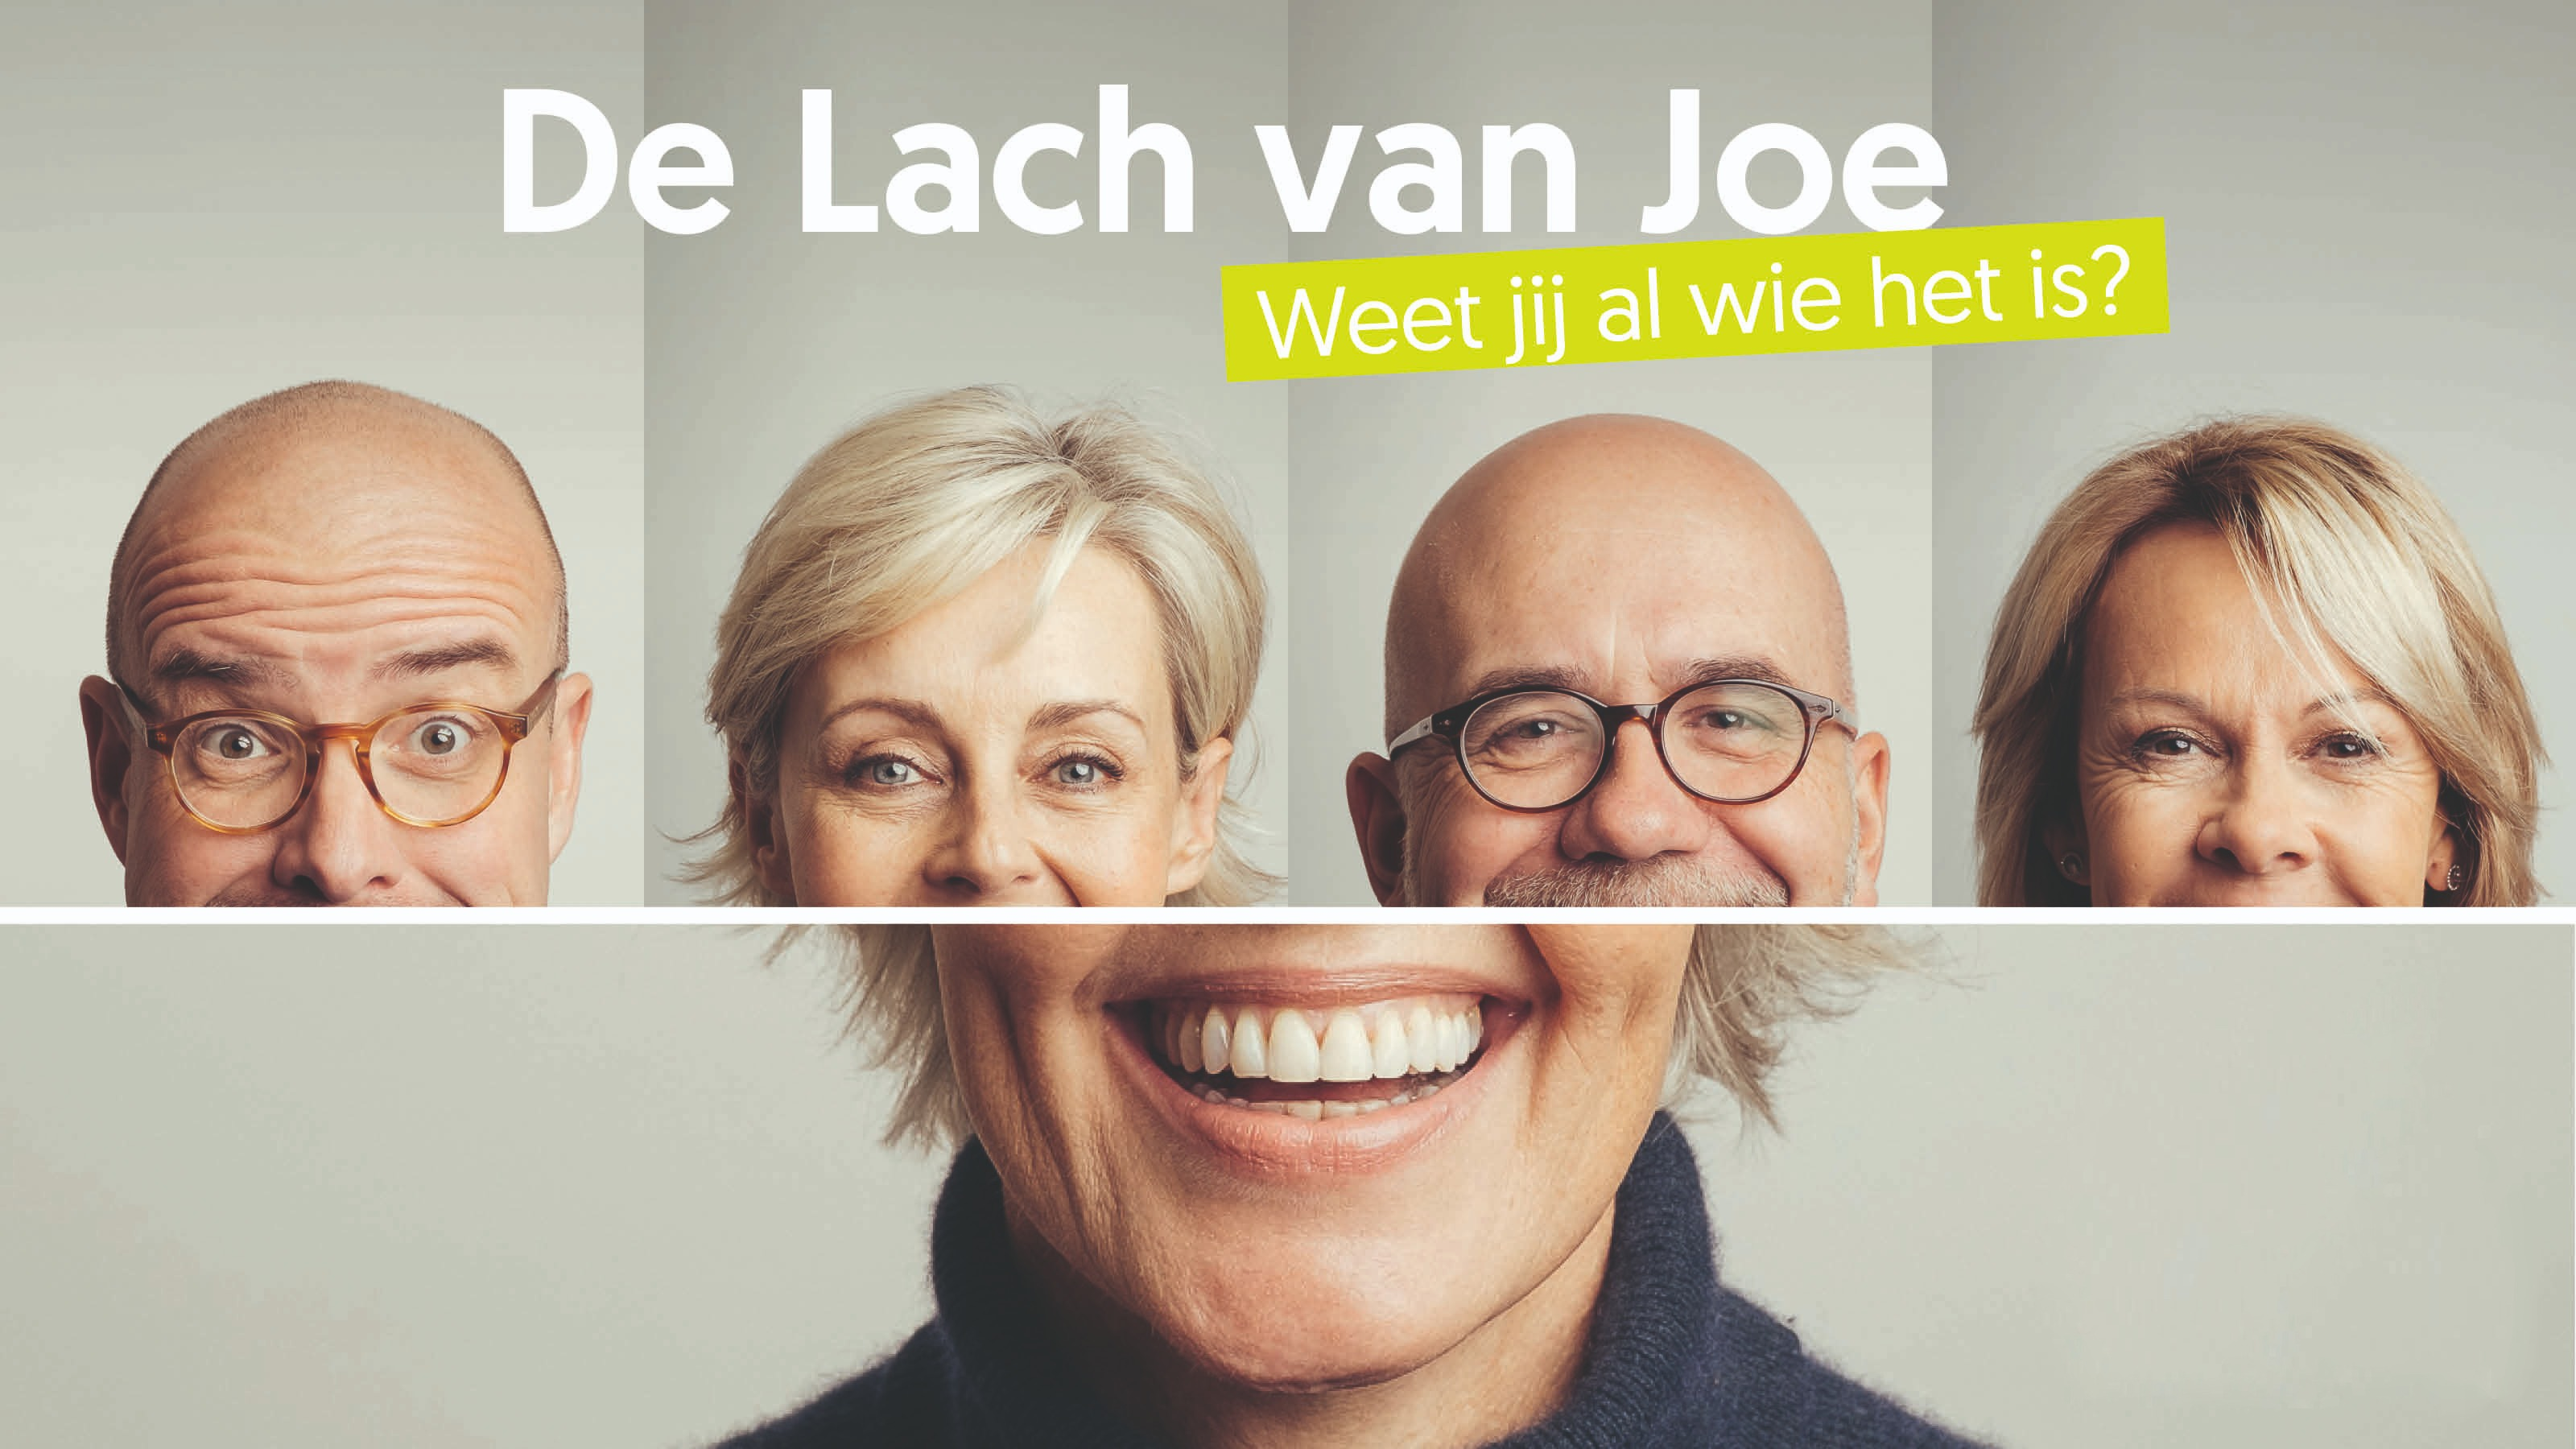 De lach van joe   zonder logo